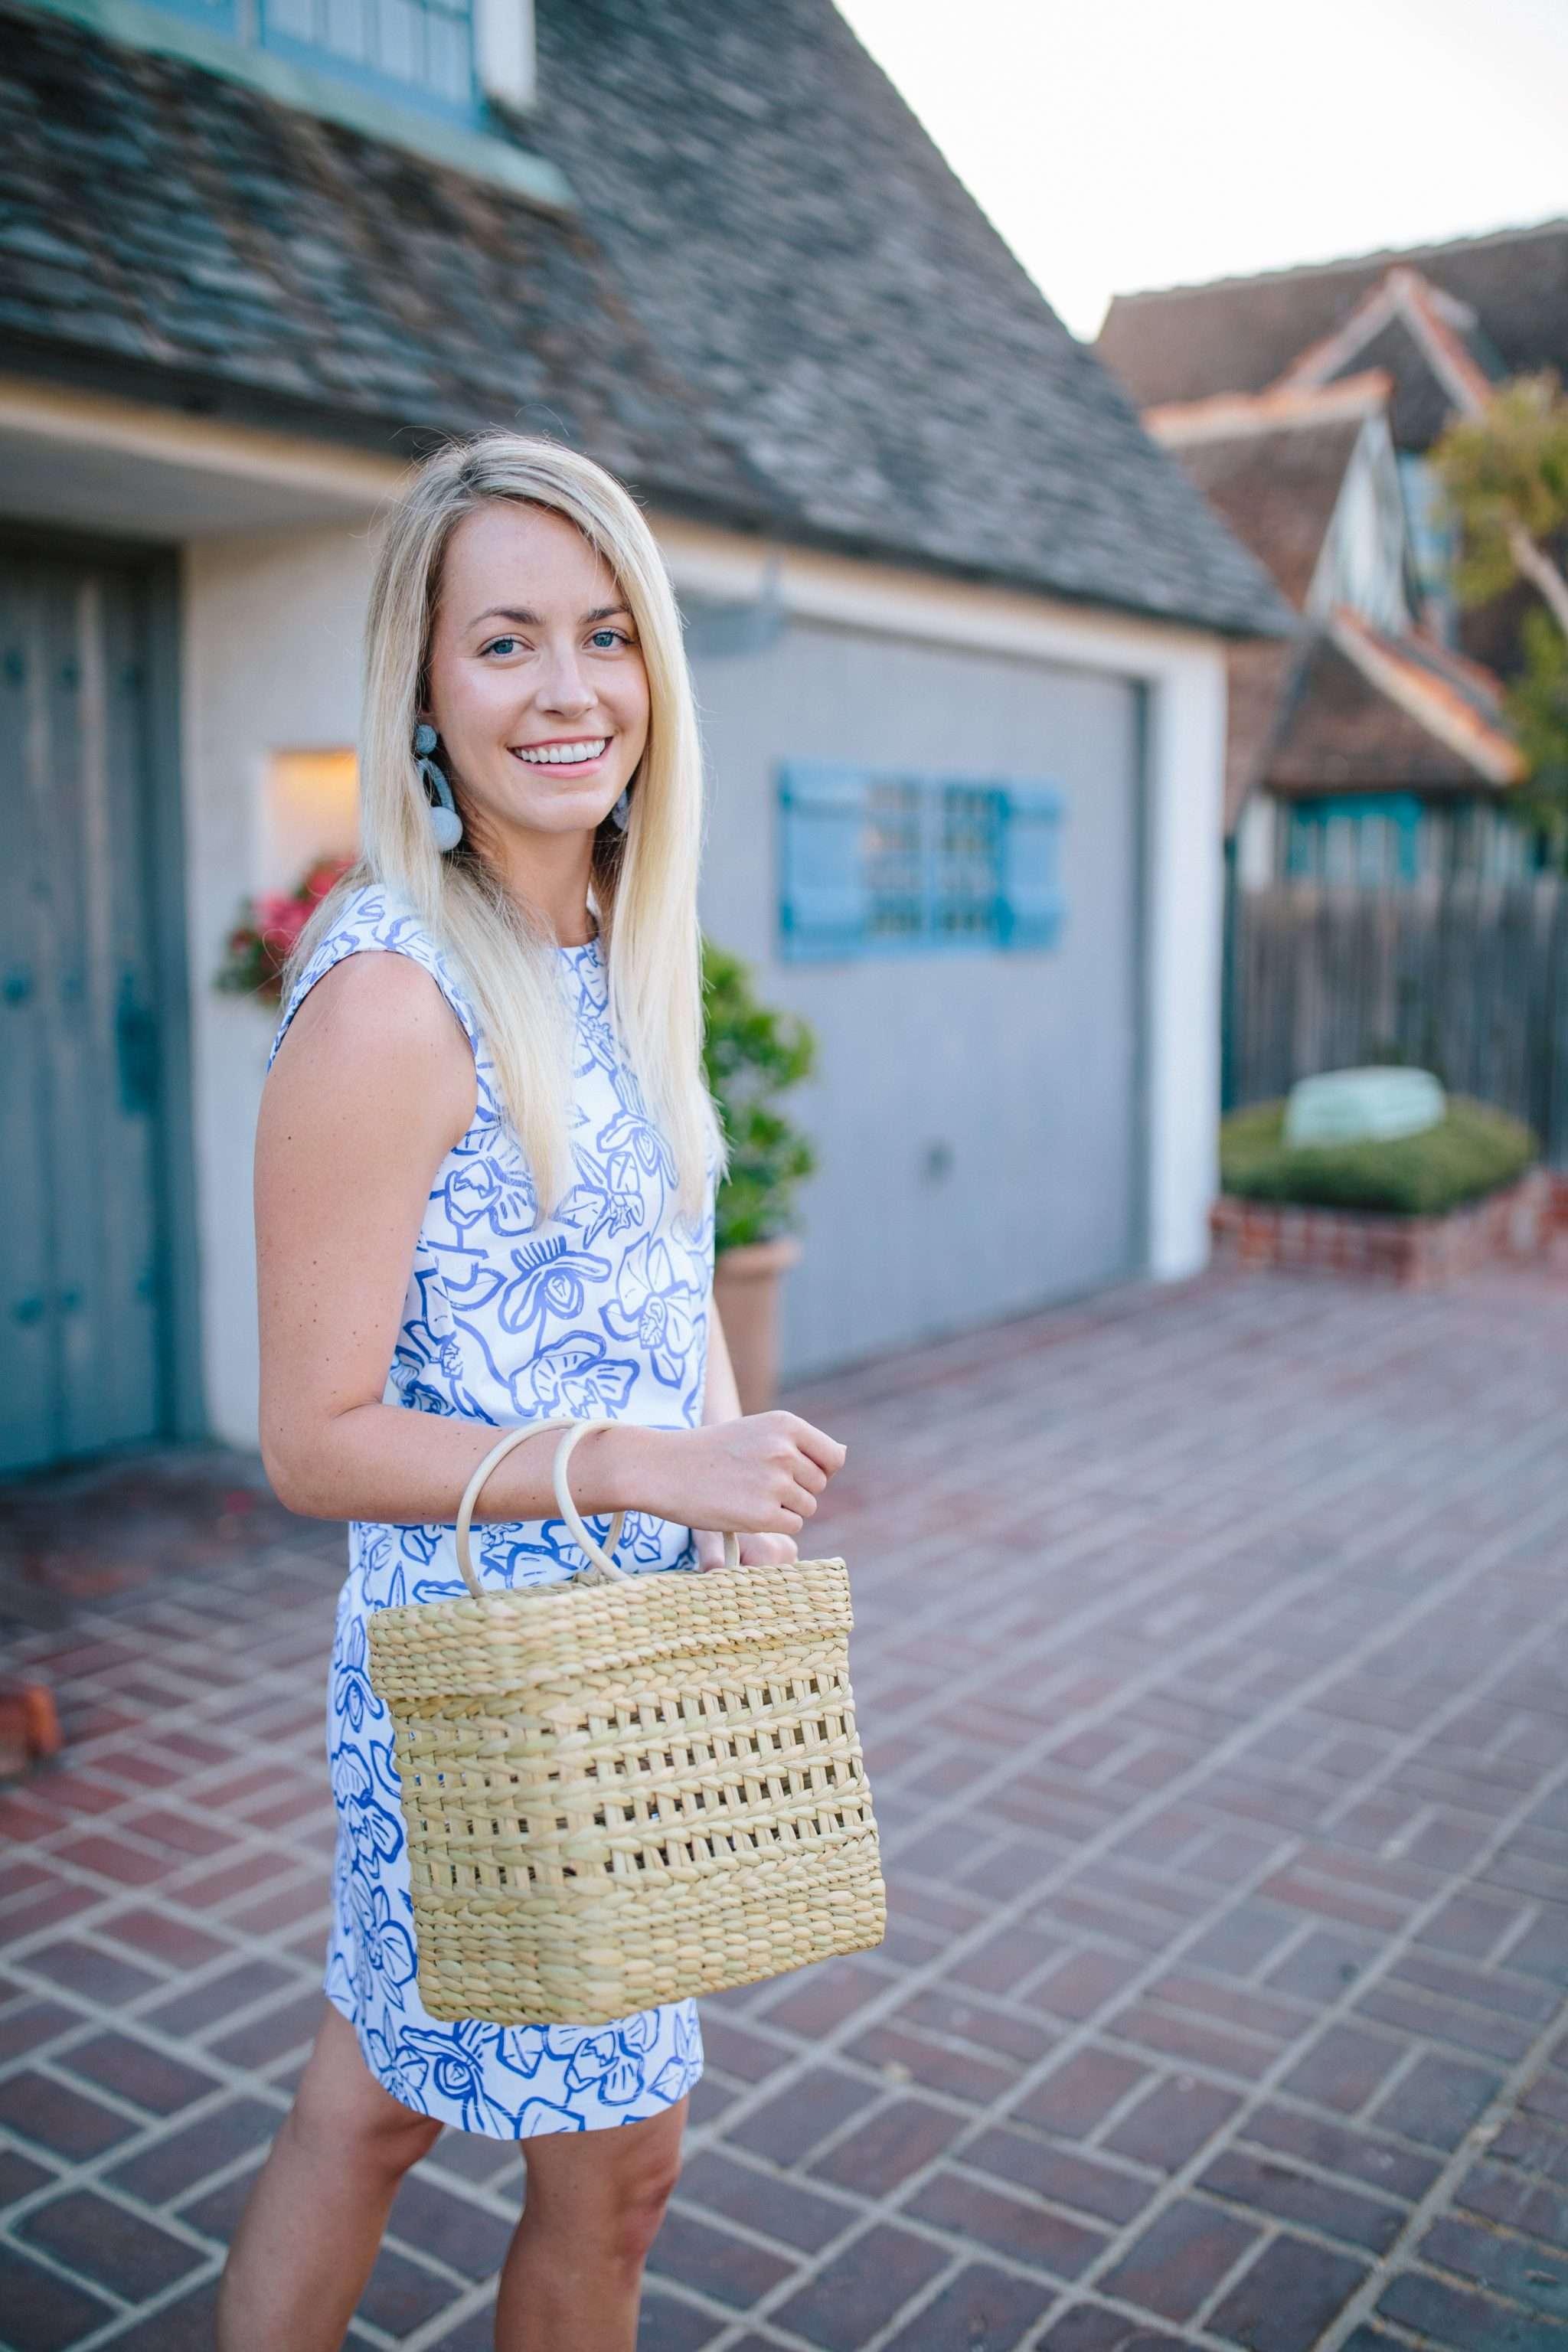 Persifor Summer Dress in San Diego, California // Rhyme & Reason